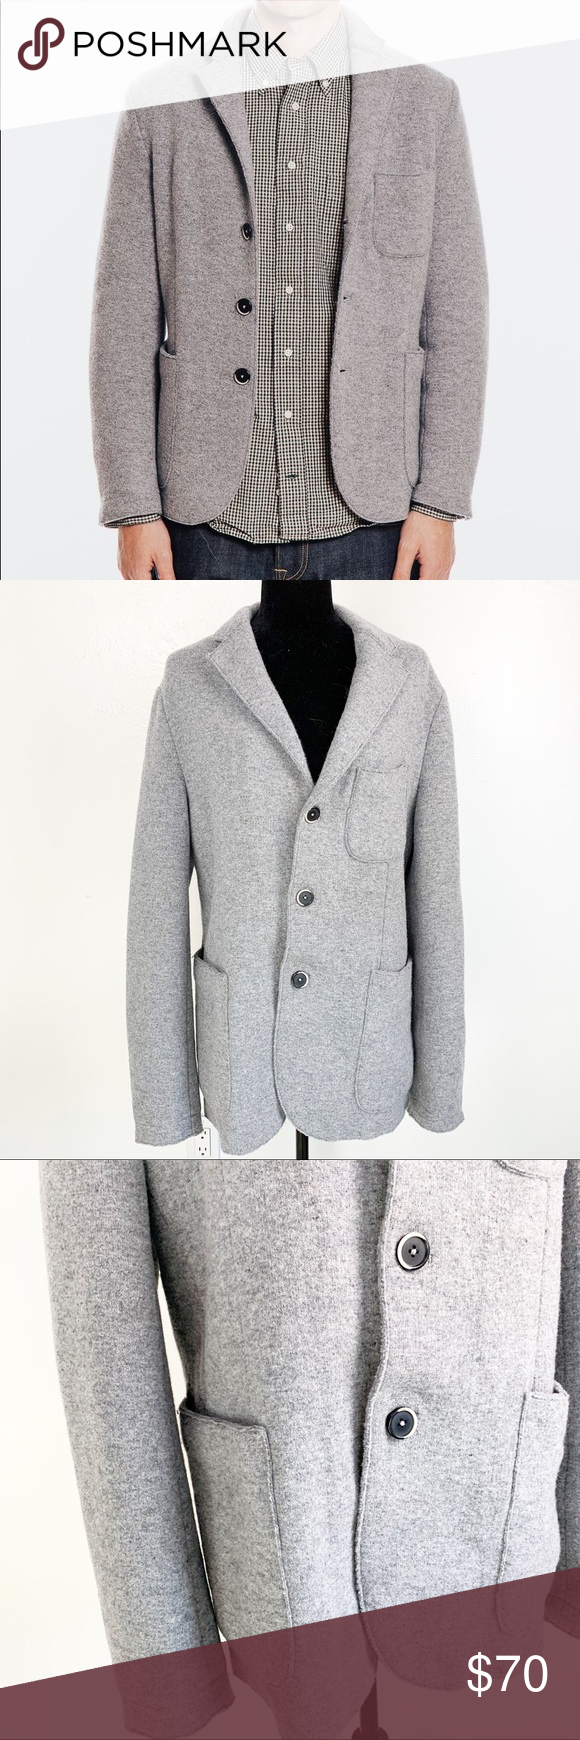 Barena Venezia Gray Felt Blazer Jacket In near new